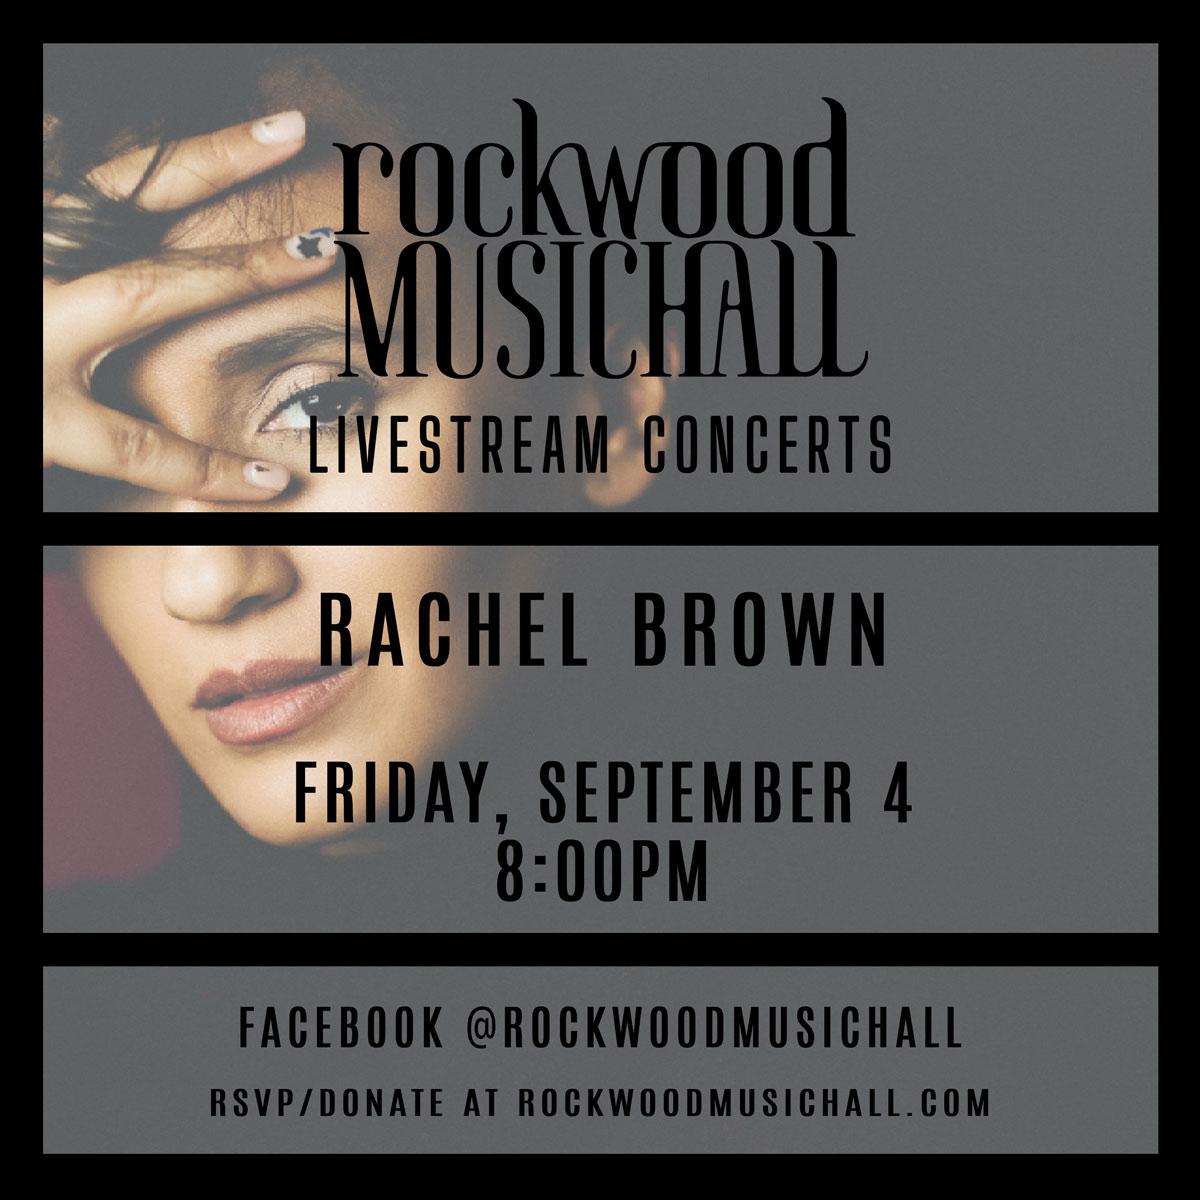 Rachel Brown Rockwood Music Hall Livestream